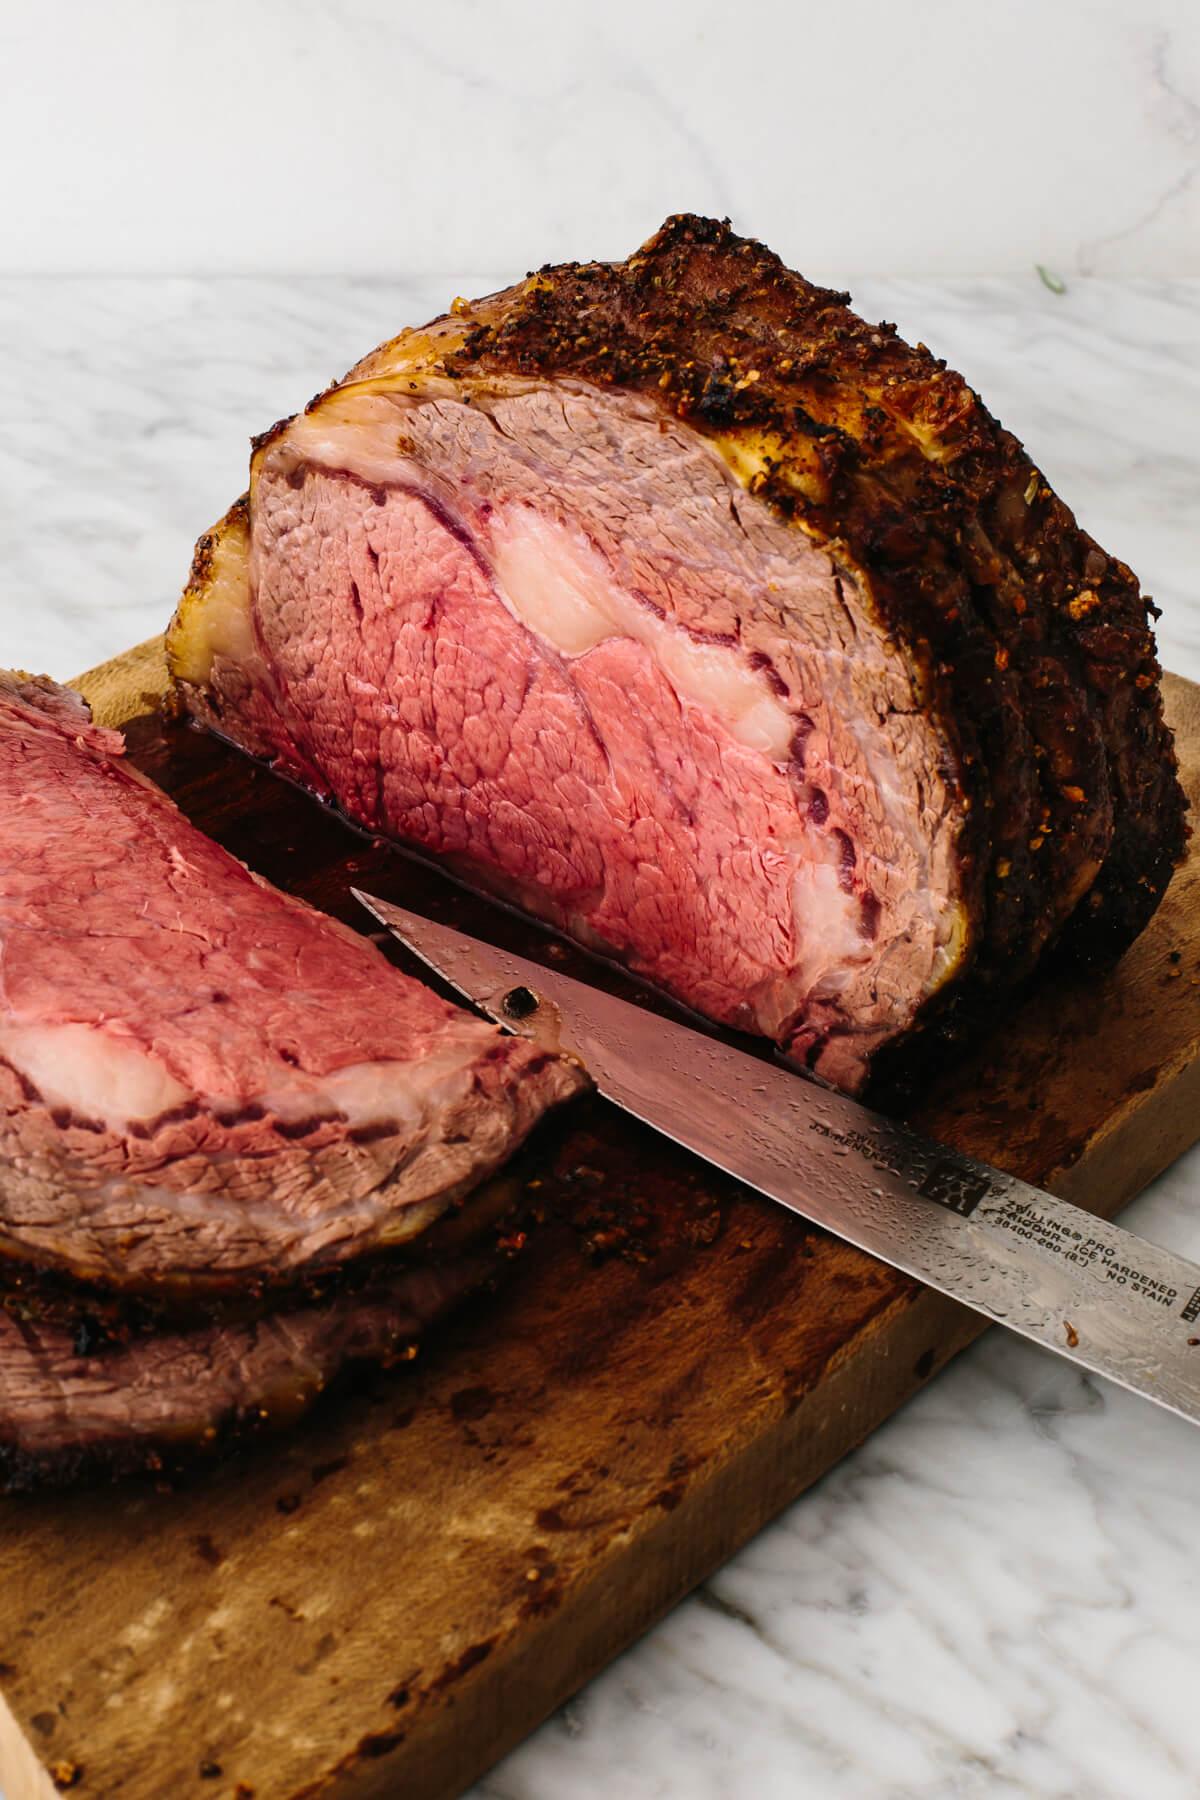 Prime rib on cutting board sliced up.